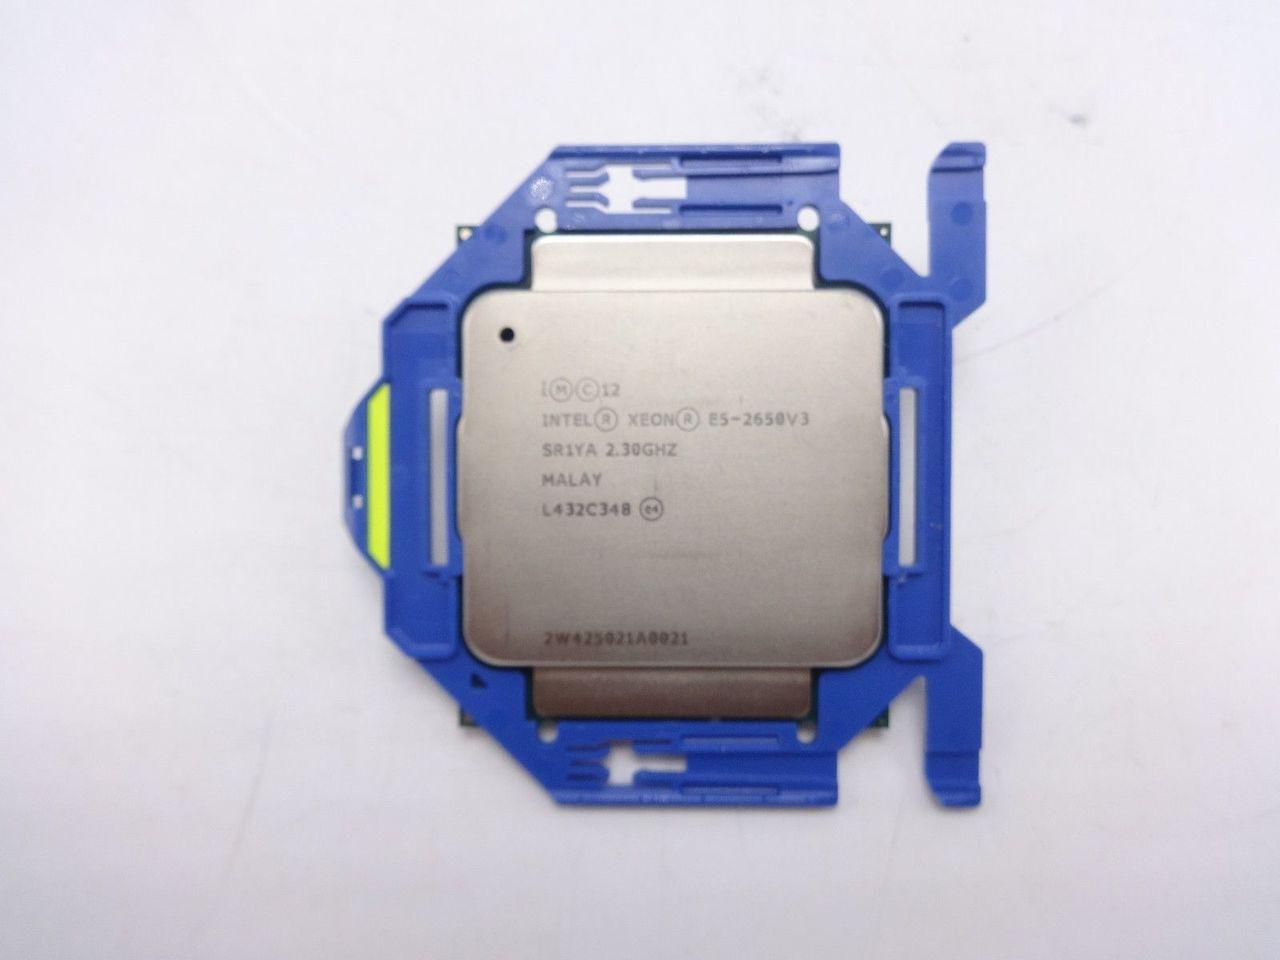 Intel SR1YA E5-2650V3 2.3GHZ 25M 10C Processor